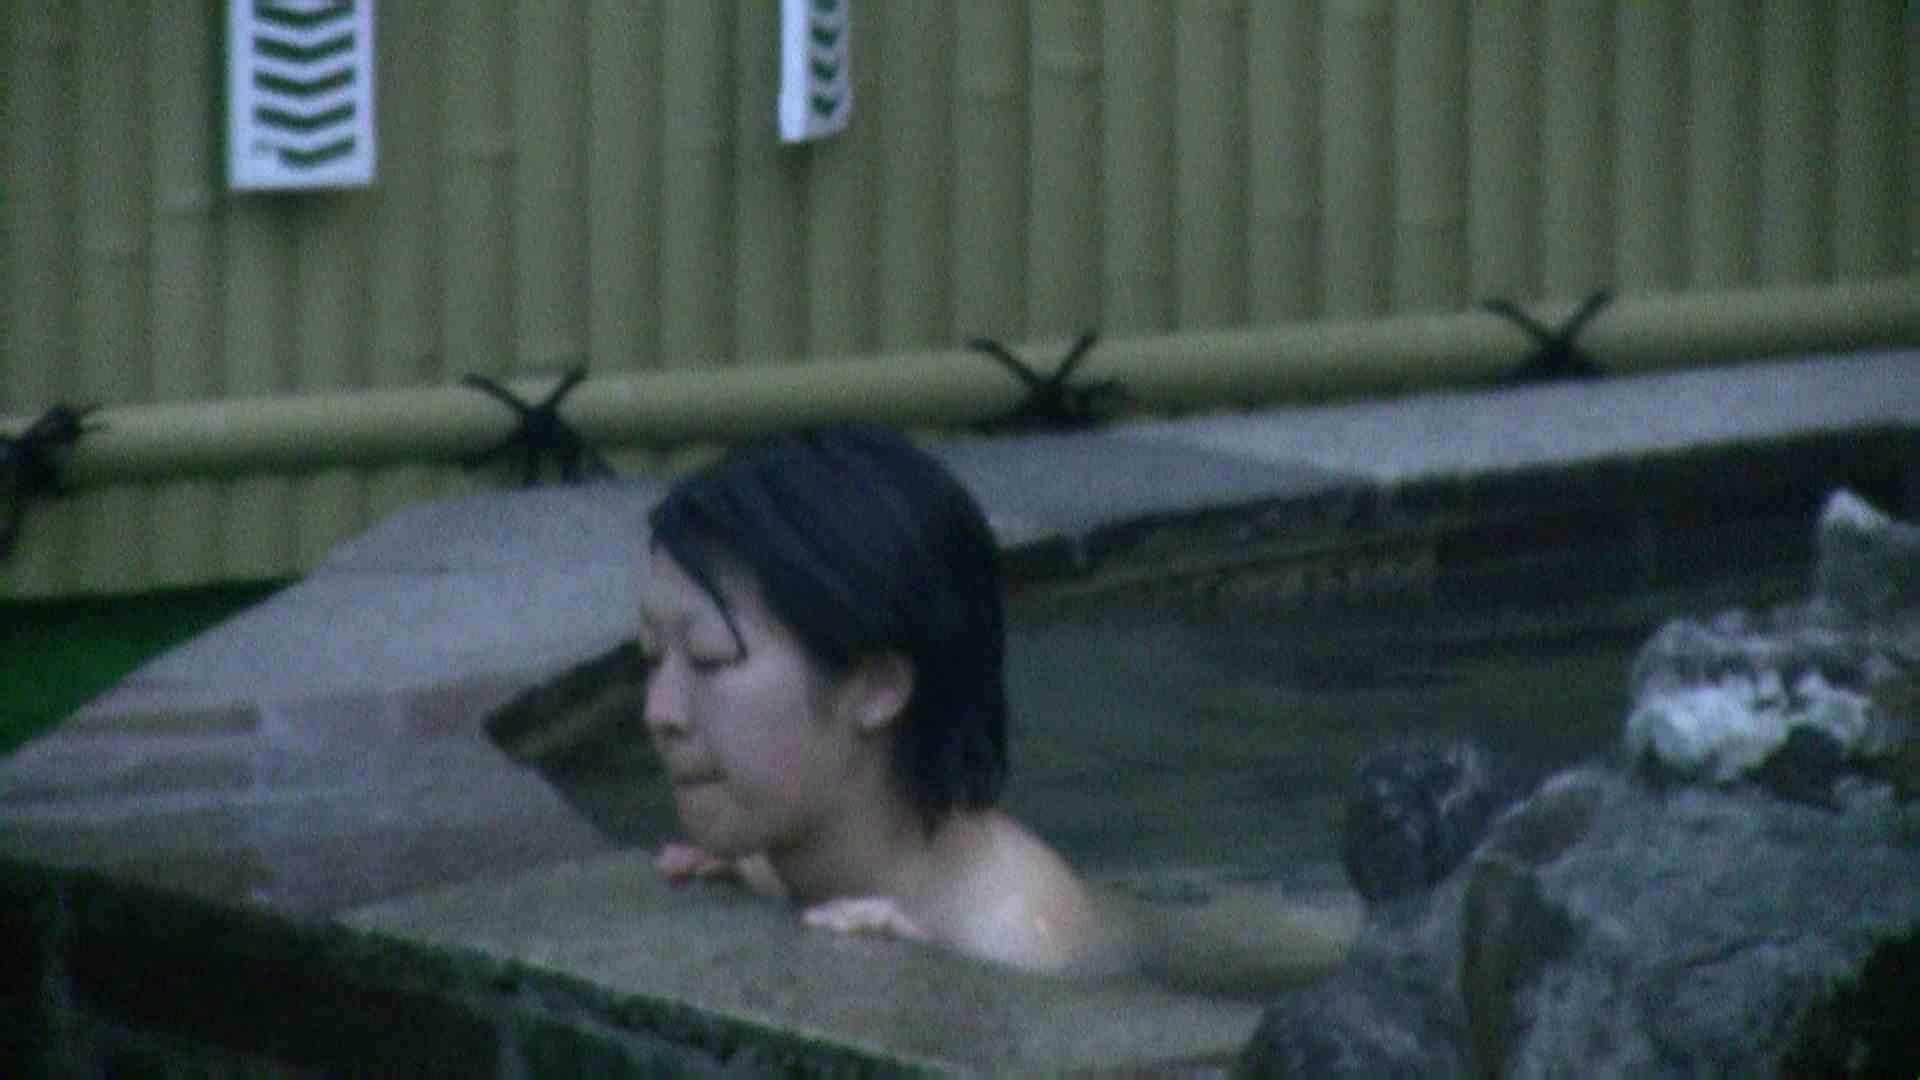 Aquaな露天風呂Vol.05【VIP】 露天風呂編  112PIX 12